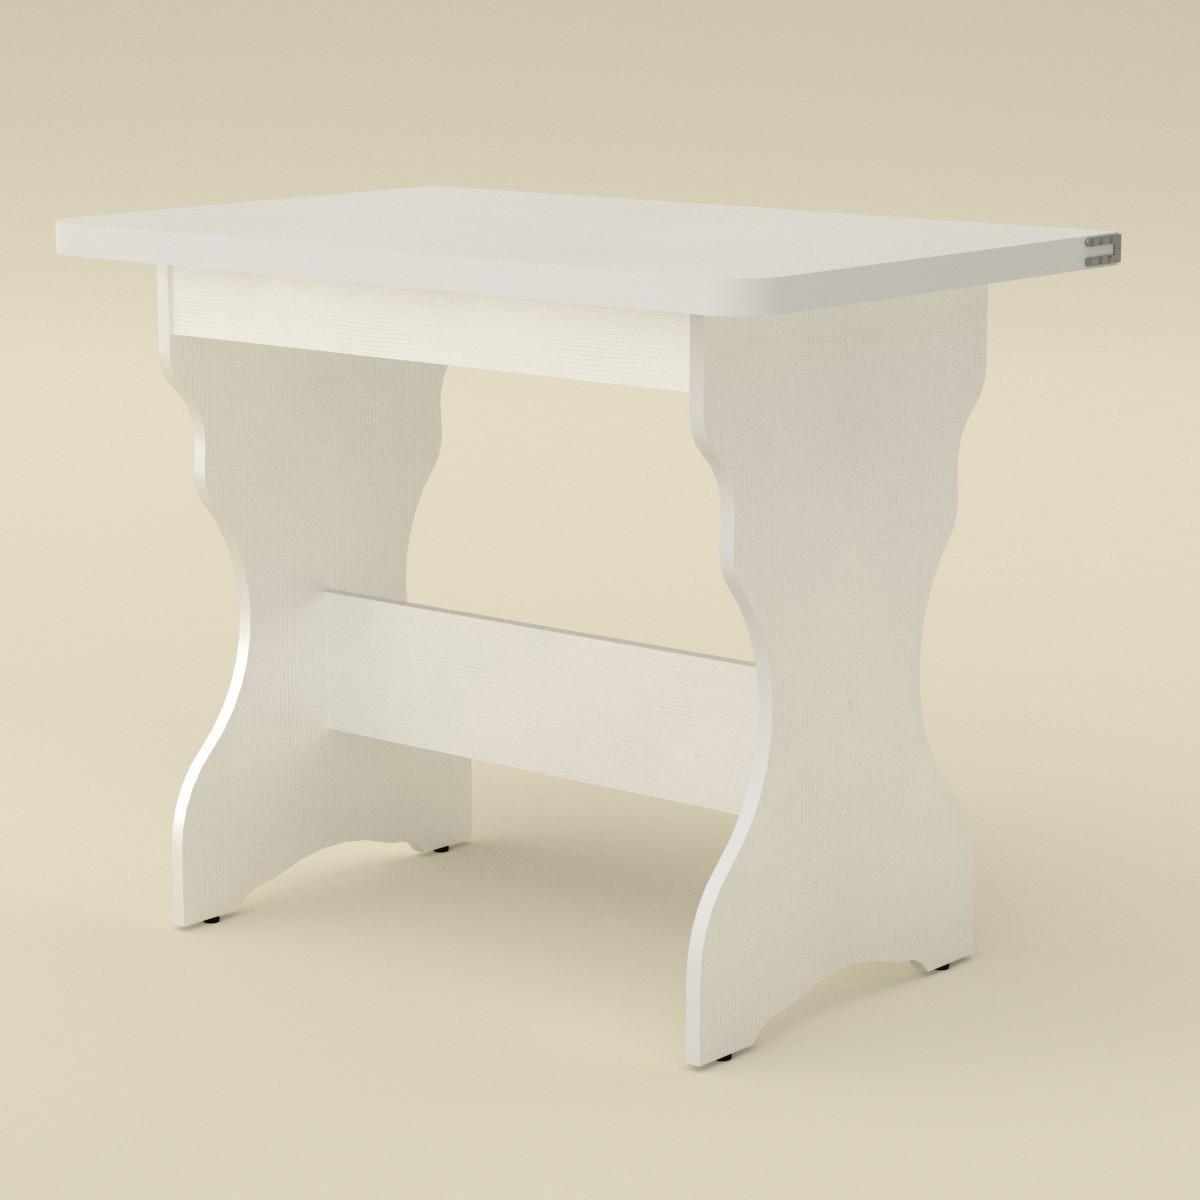 Стол кухонный КС-3 яблоня Компанит (90х59х73 см), фото 2